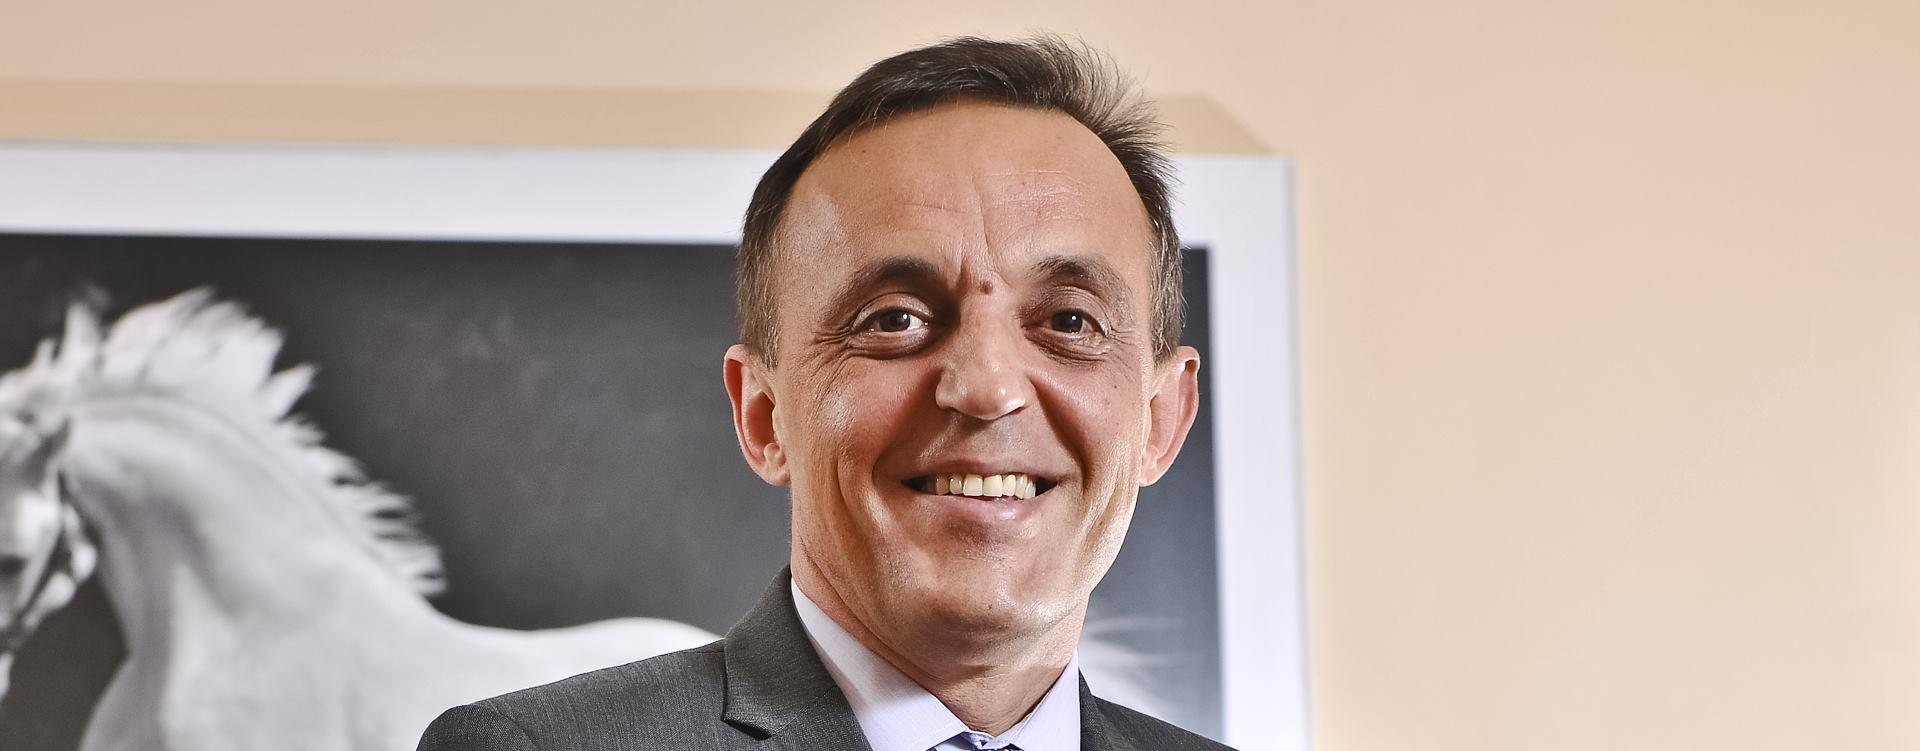 HDSSB UPOZORAVA: Sprema se pljačka hrvatskog sela